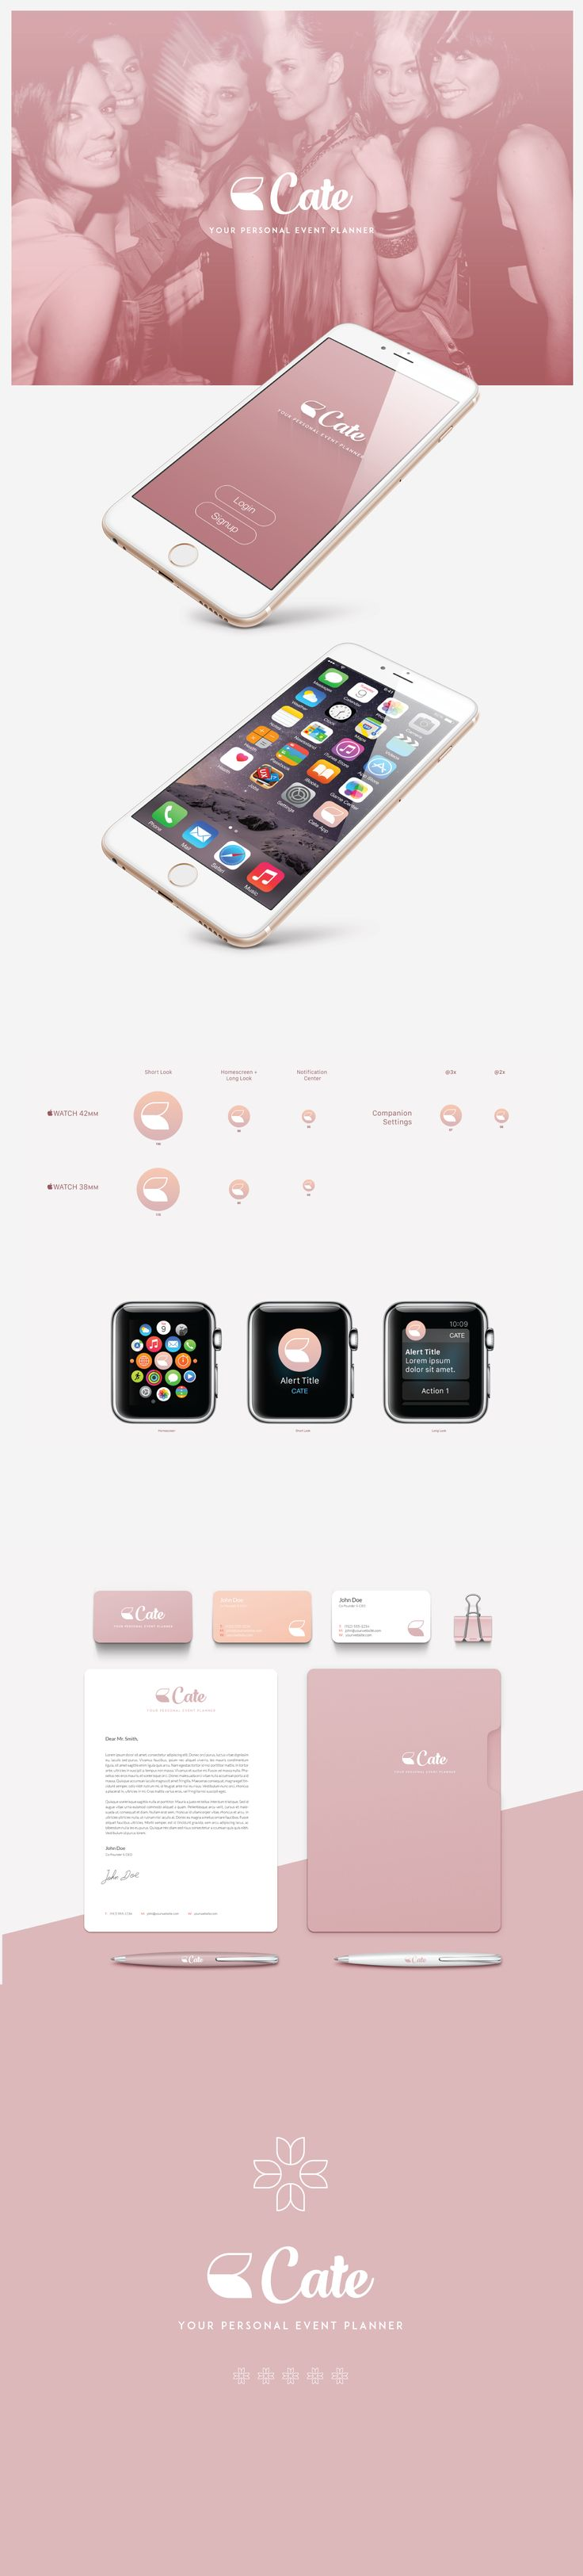 Fashion, beauty logo design and app icon.